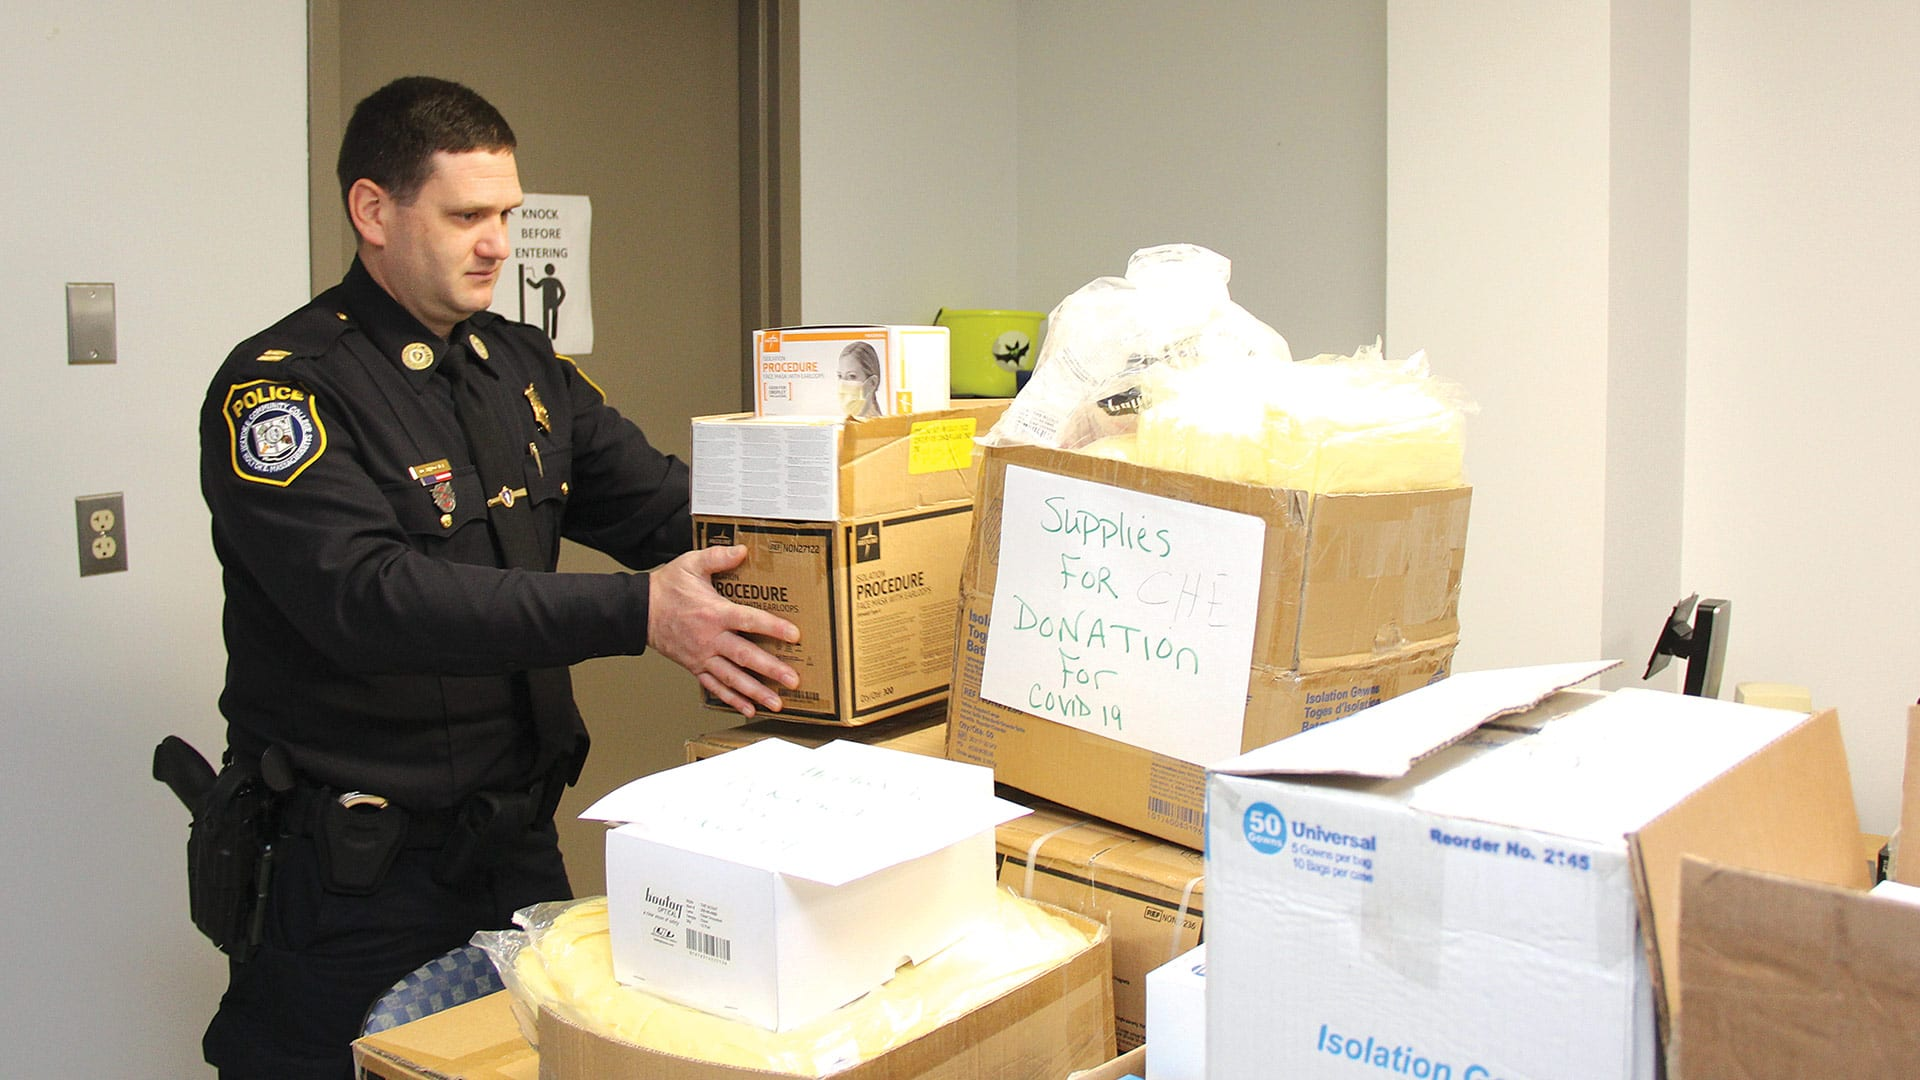 HCC Police Captain Dale Brown stacks boxes